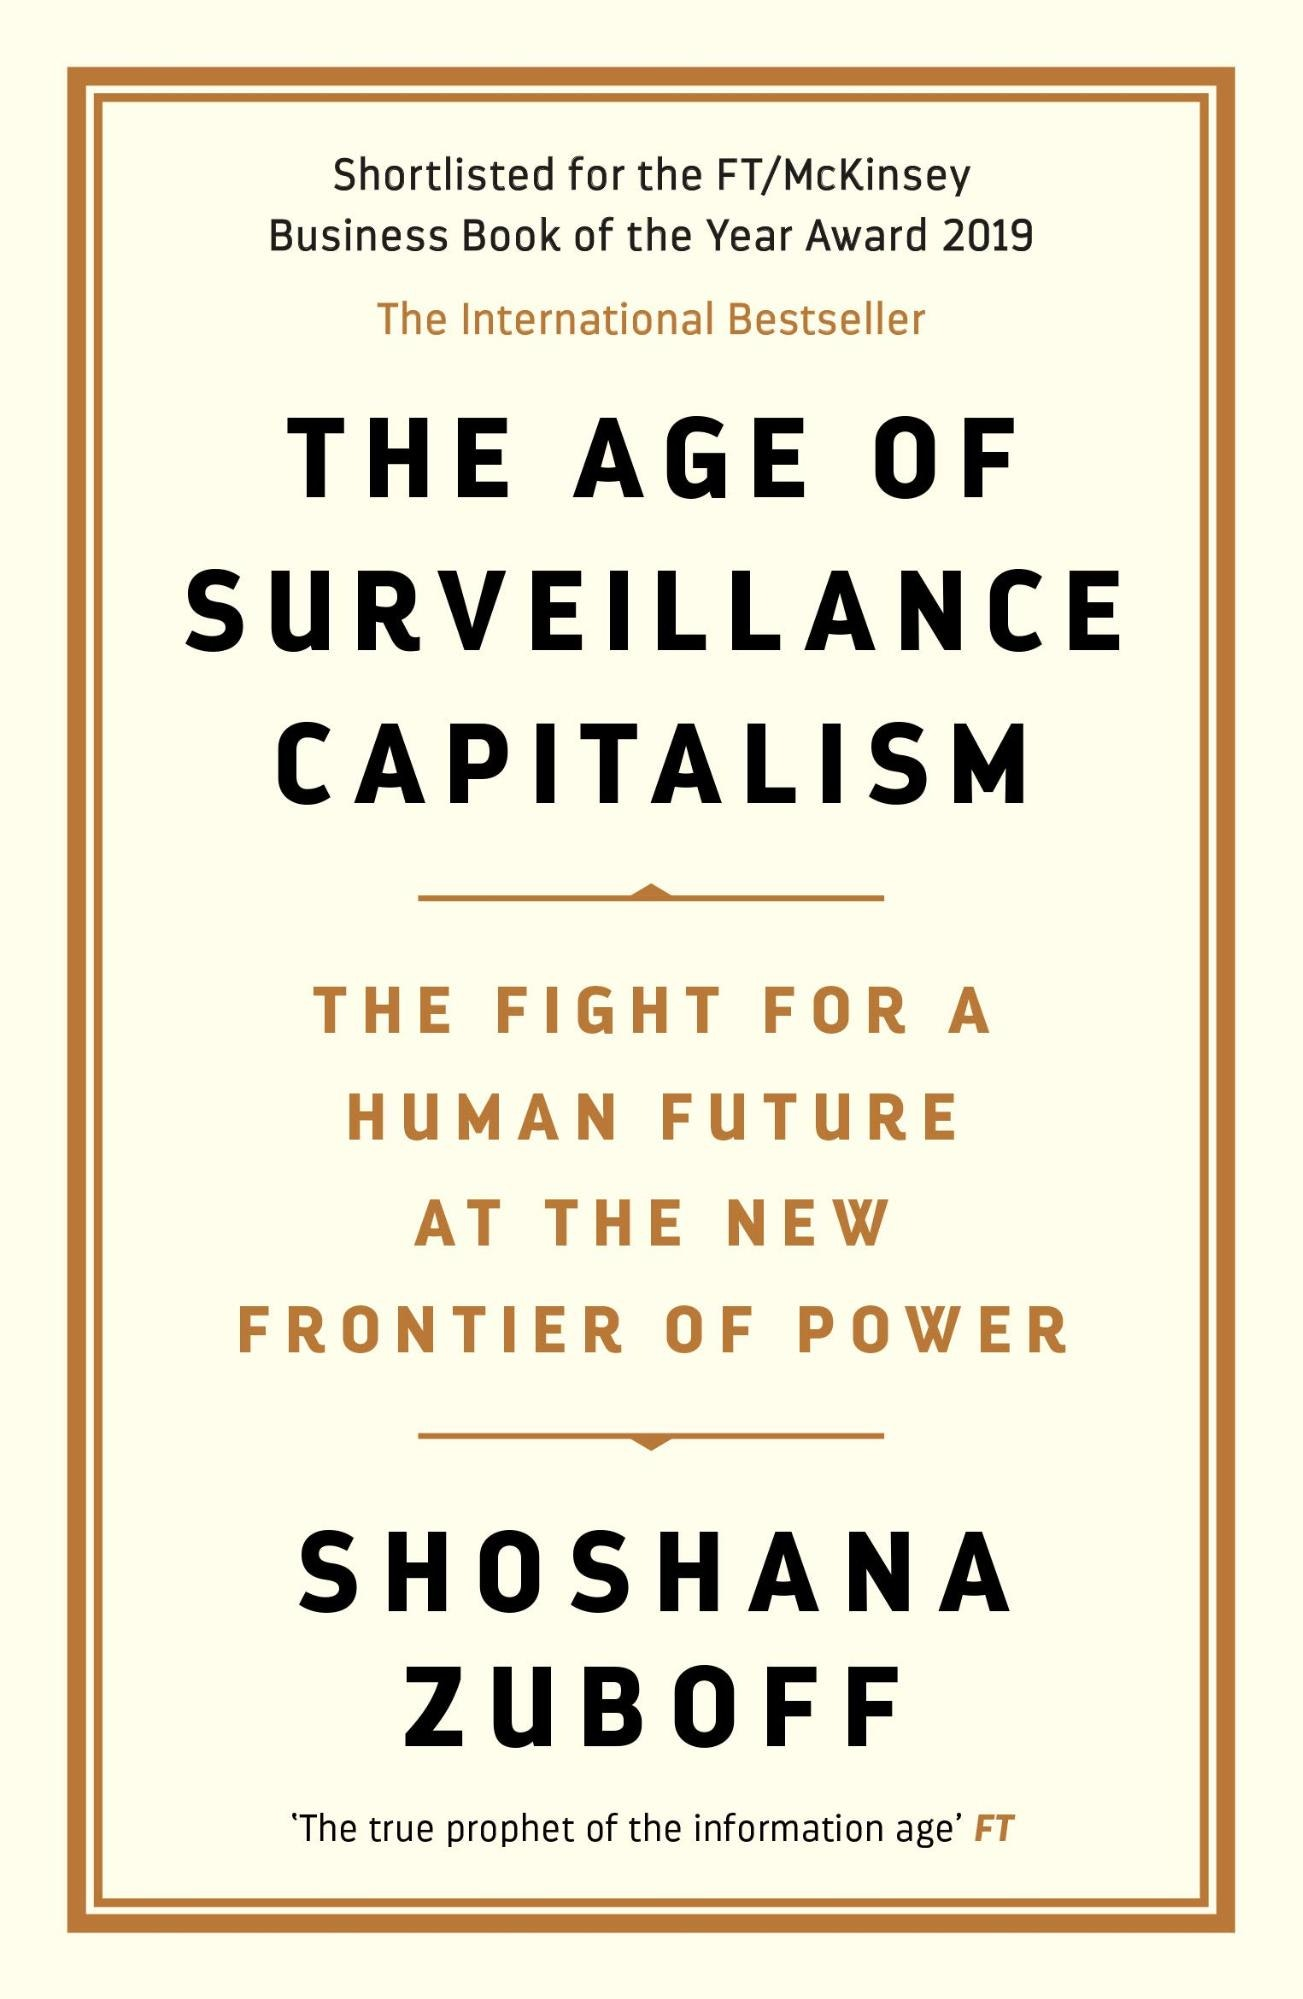 The age of Surveillance Capitalism – Shoshana Zuboff